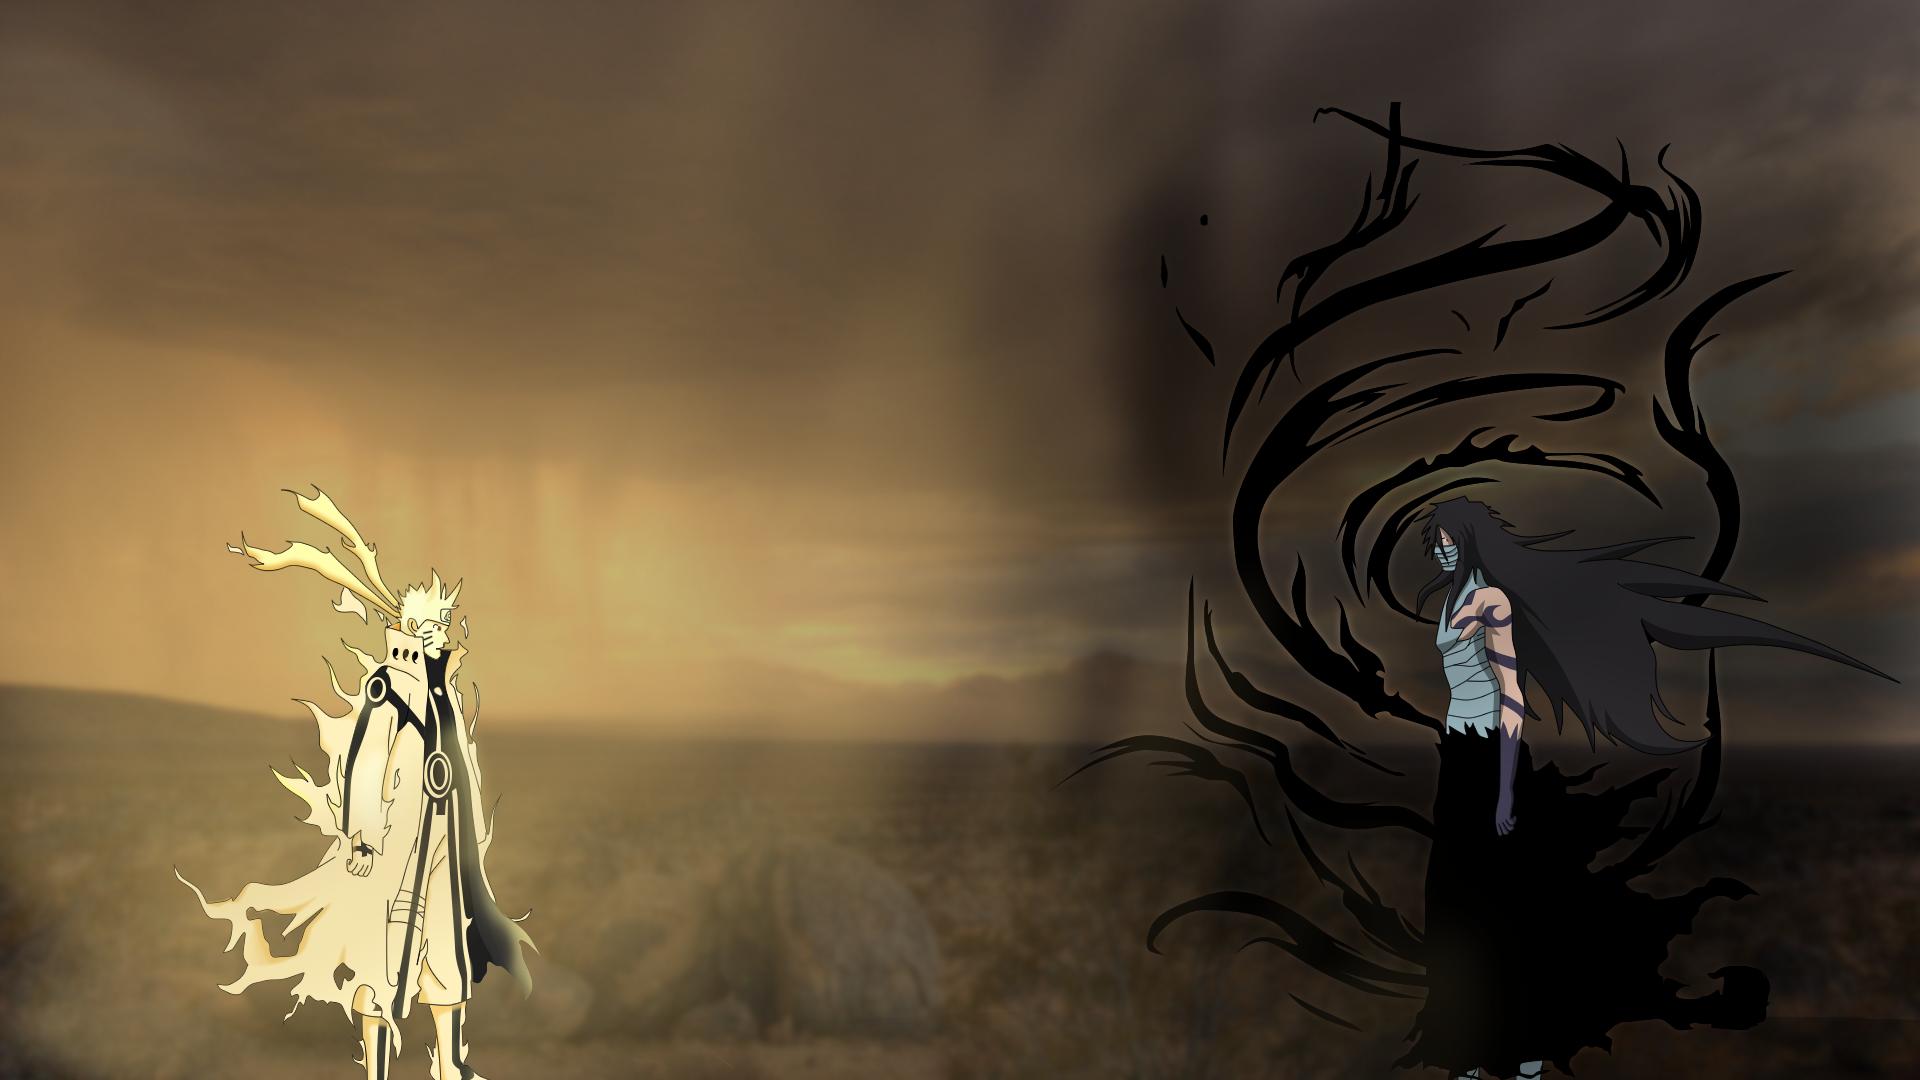 Ichigo vs Naruto Full HD Wallpaper and Background ... | 1920 x 1080 png 1372kB